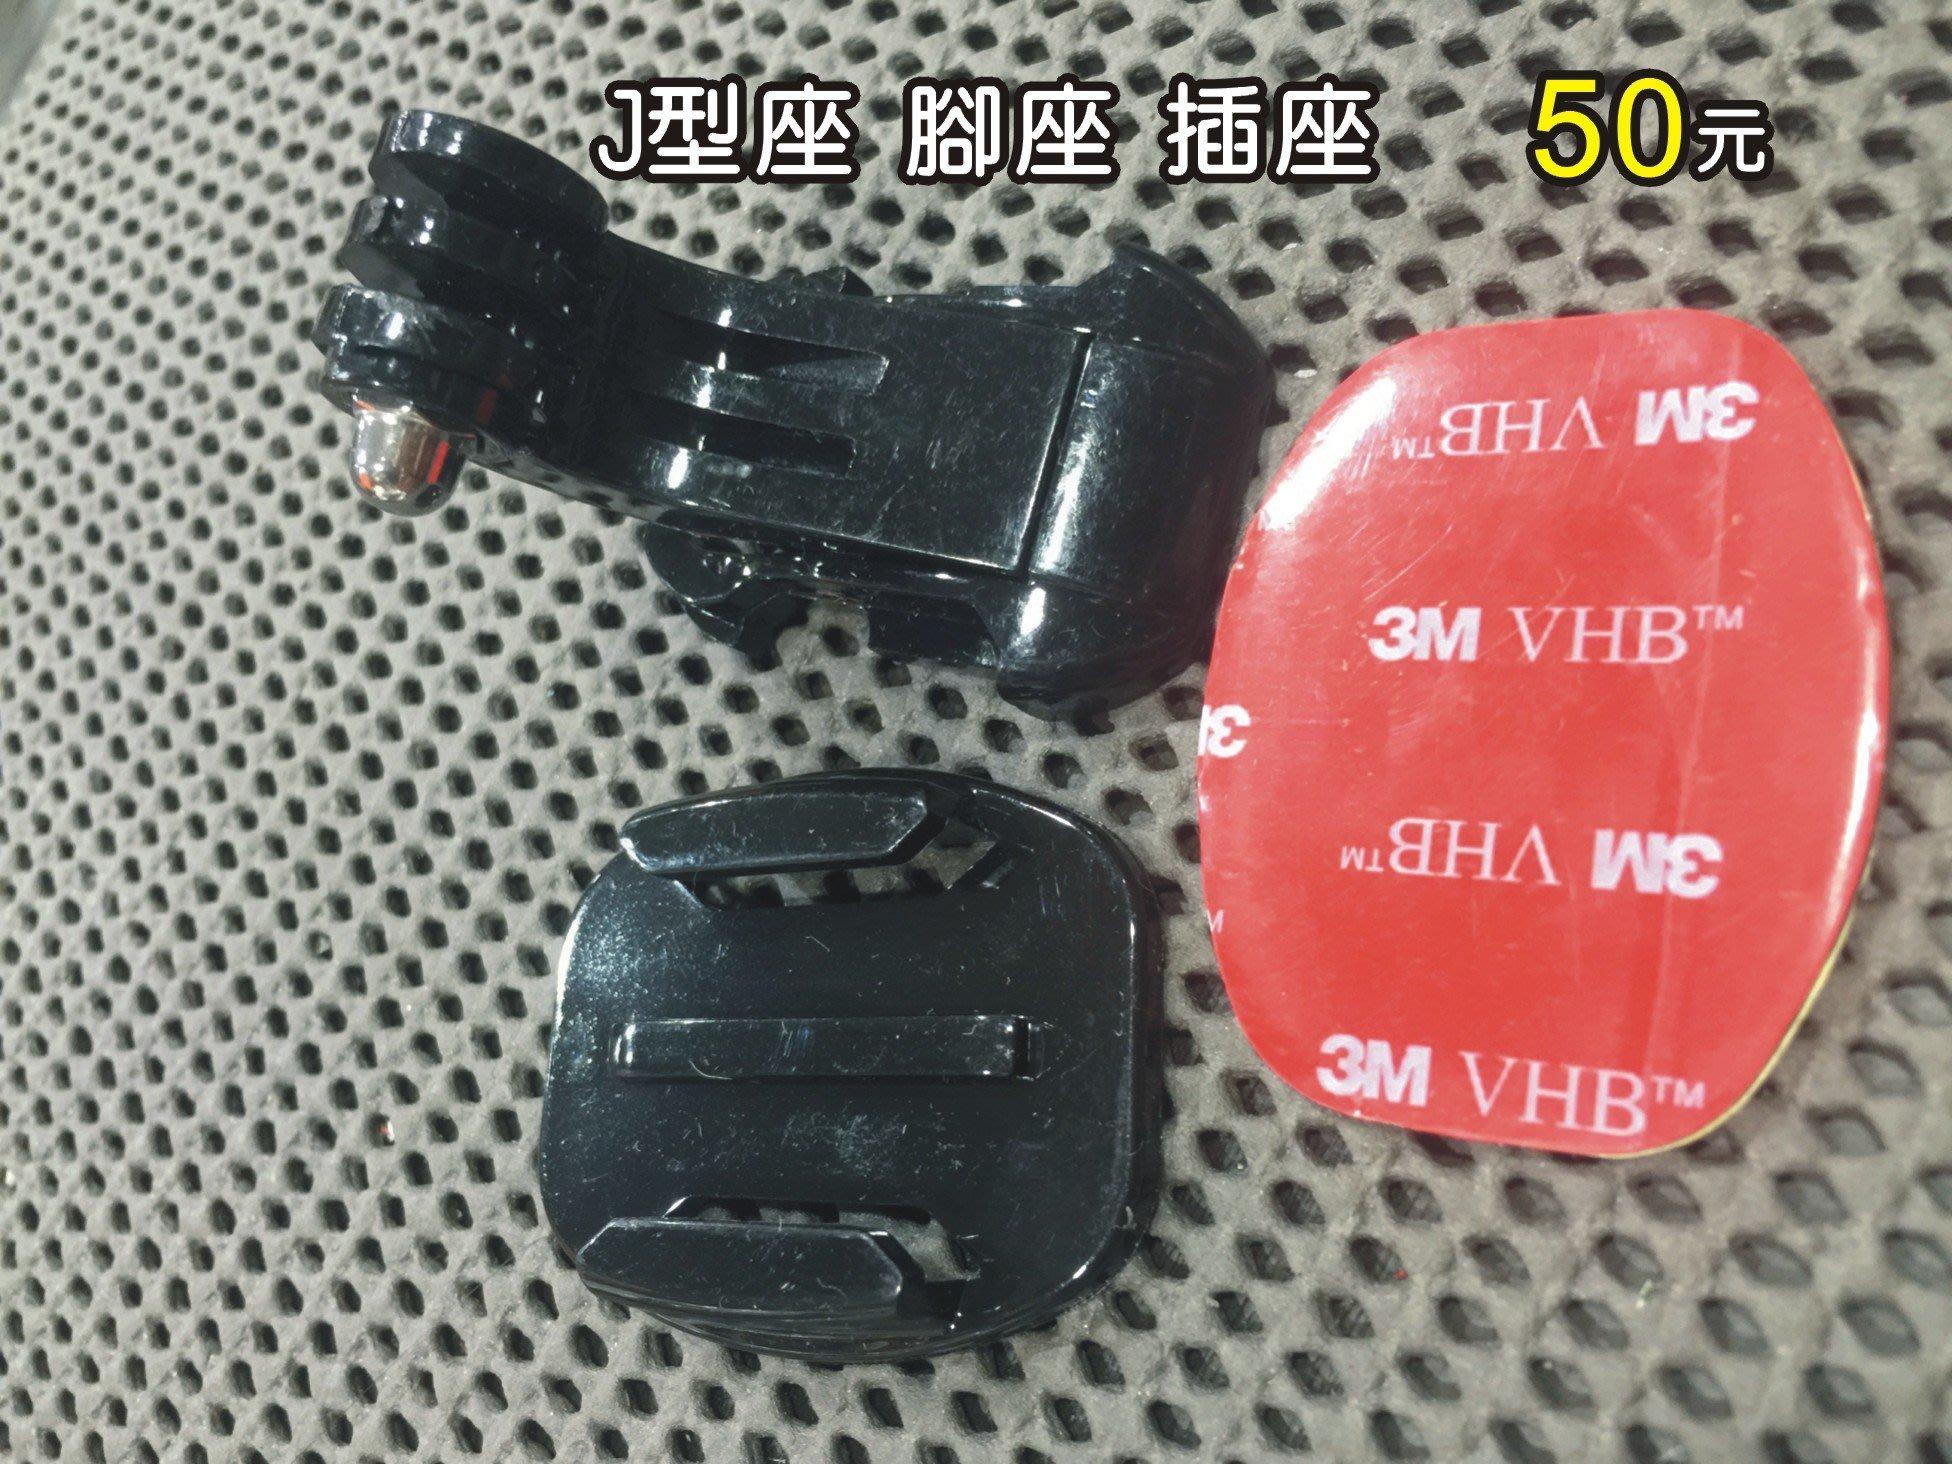 5mj.tw GOPRO J型座 固定鎖 金屬 hero4 hero3 多角度固定組iphone 6s也可夾